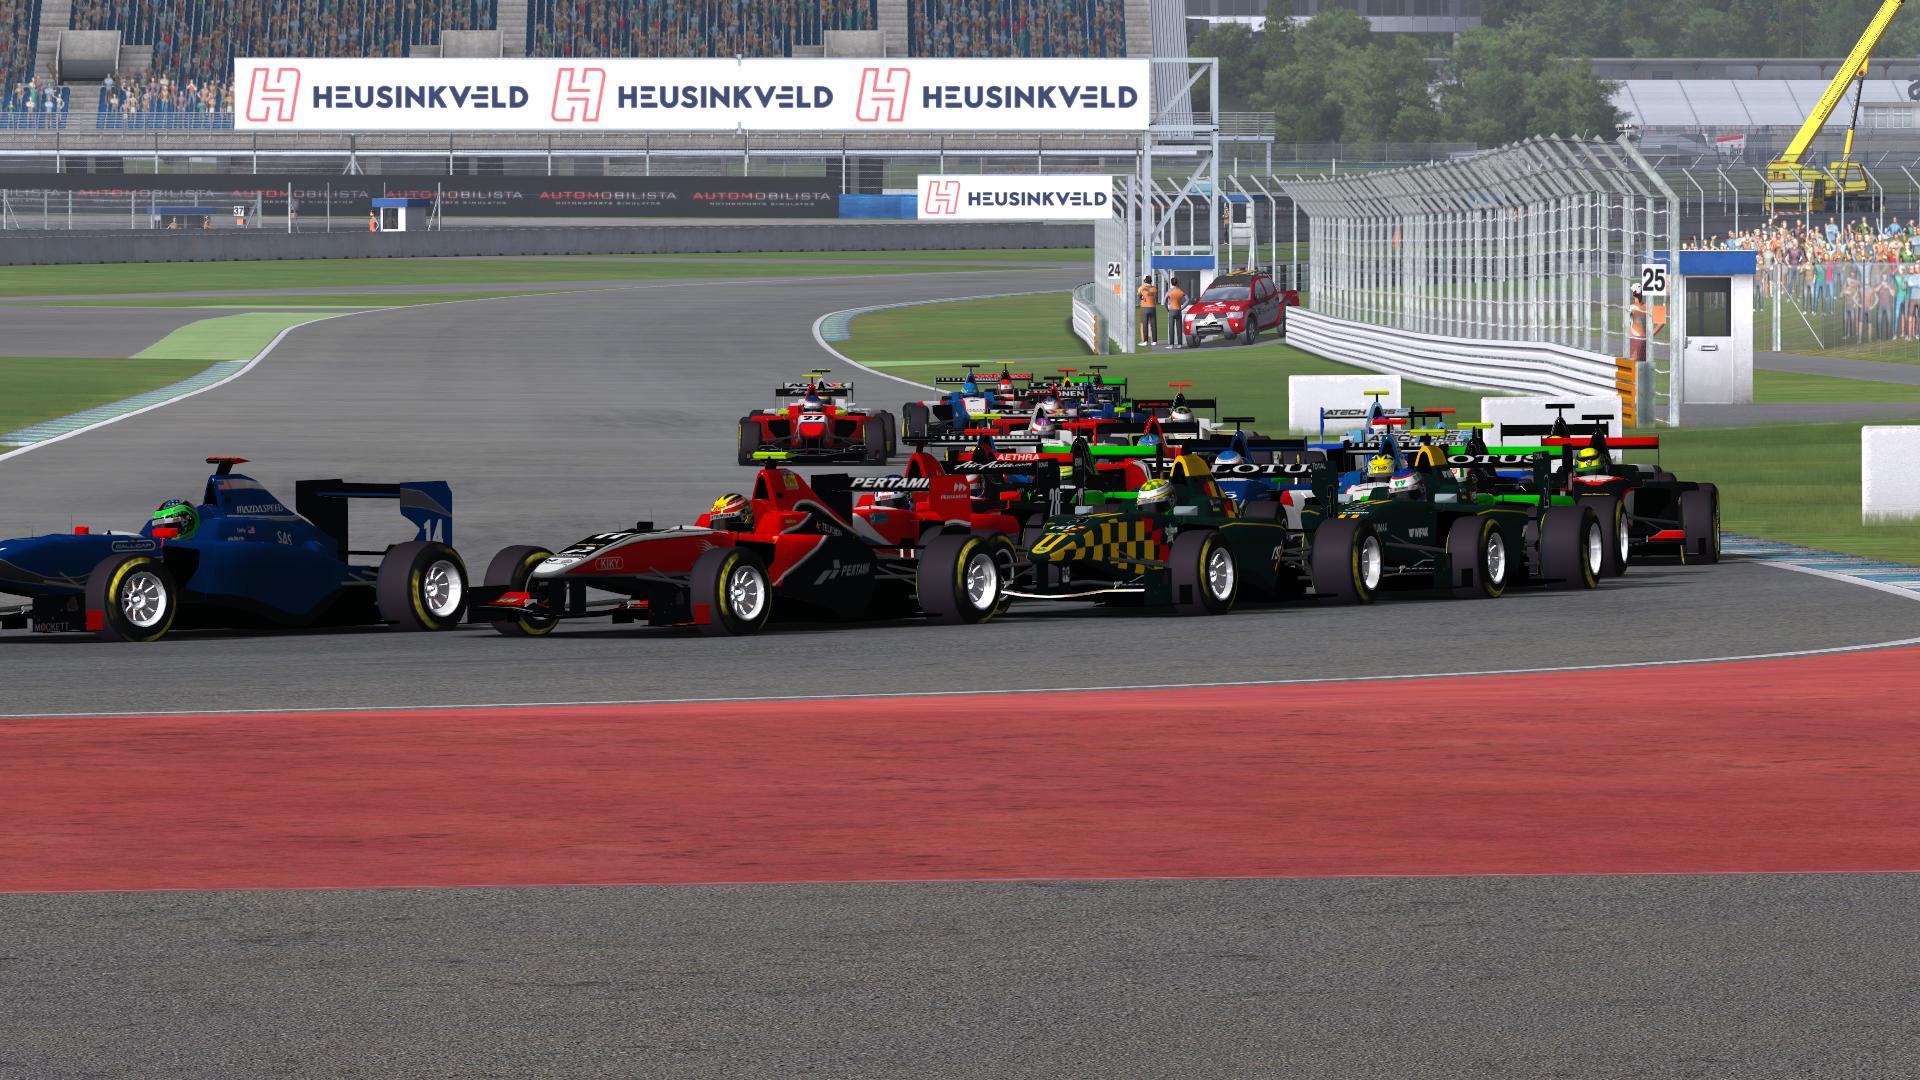 [AMS] 2010-12 GP3 Series v1.0 by .Race9 Modding GP3-1